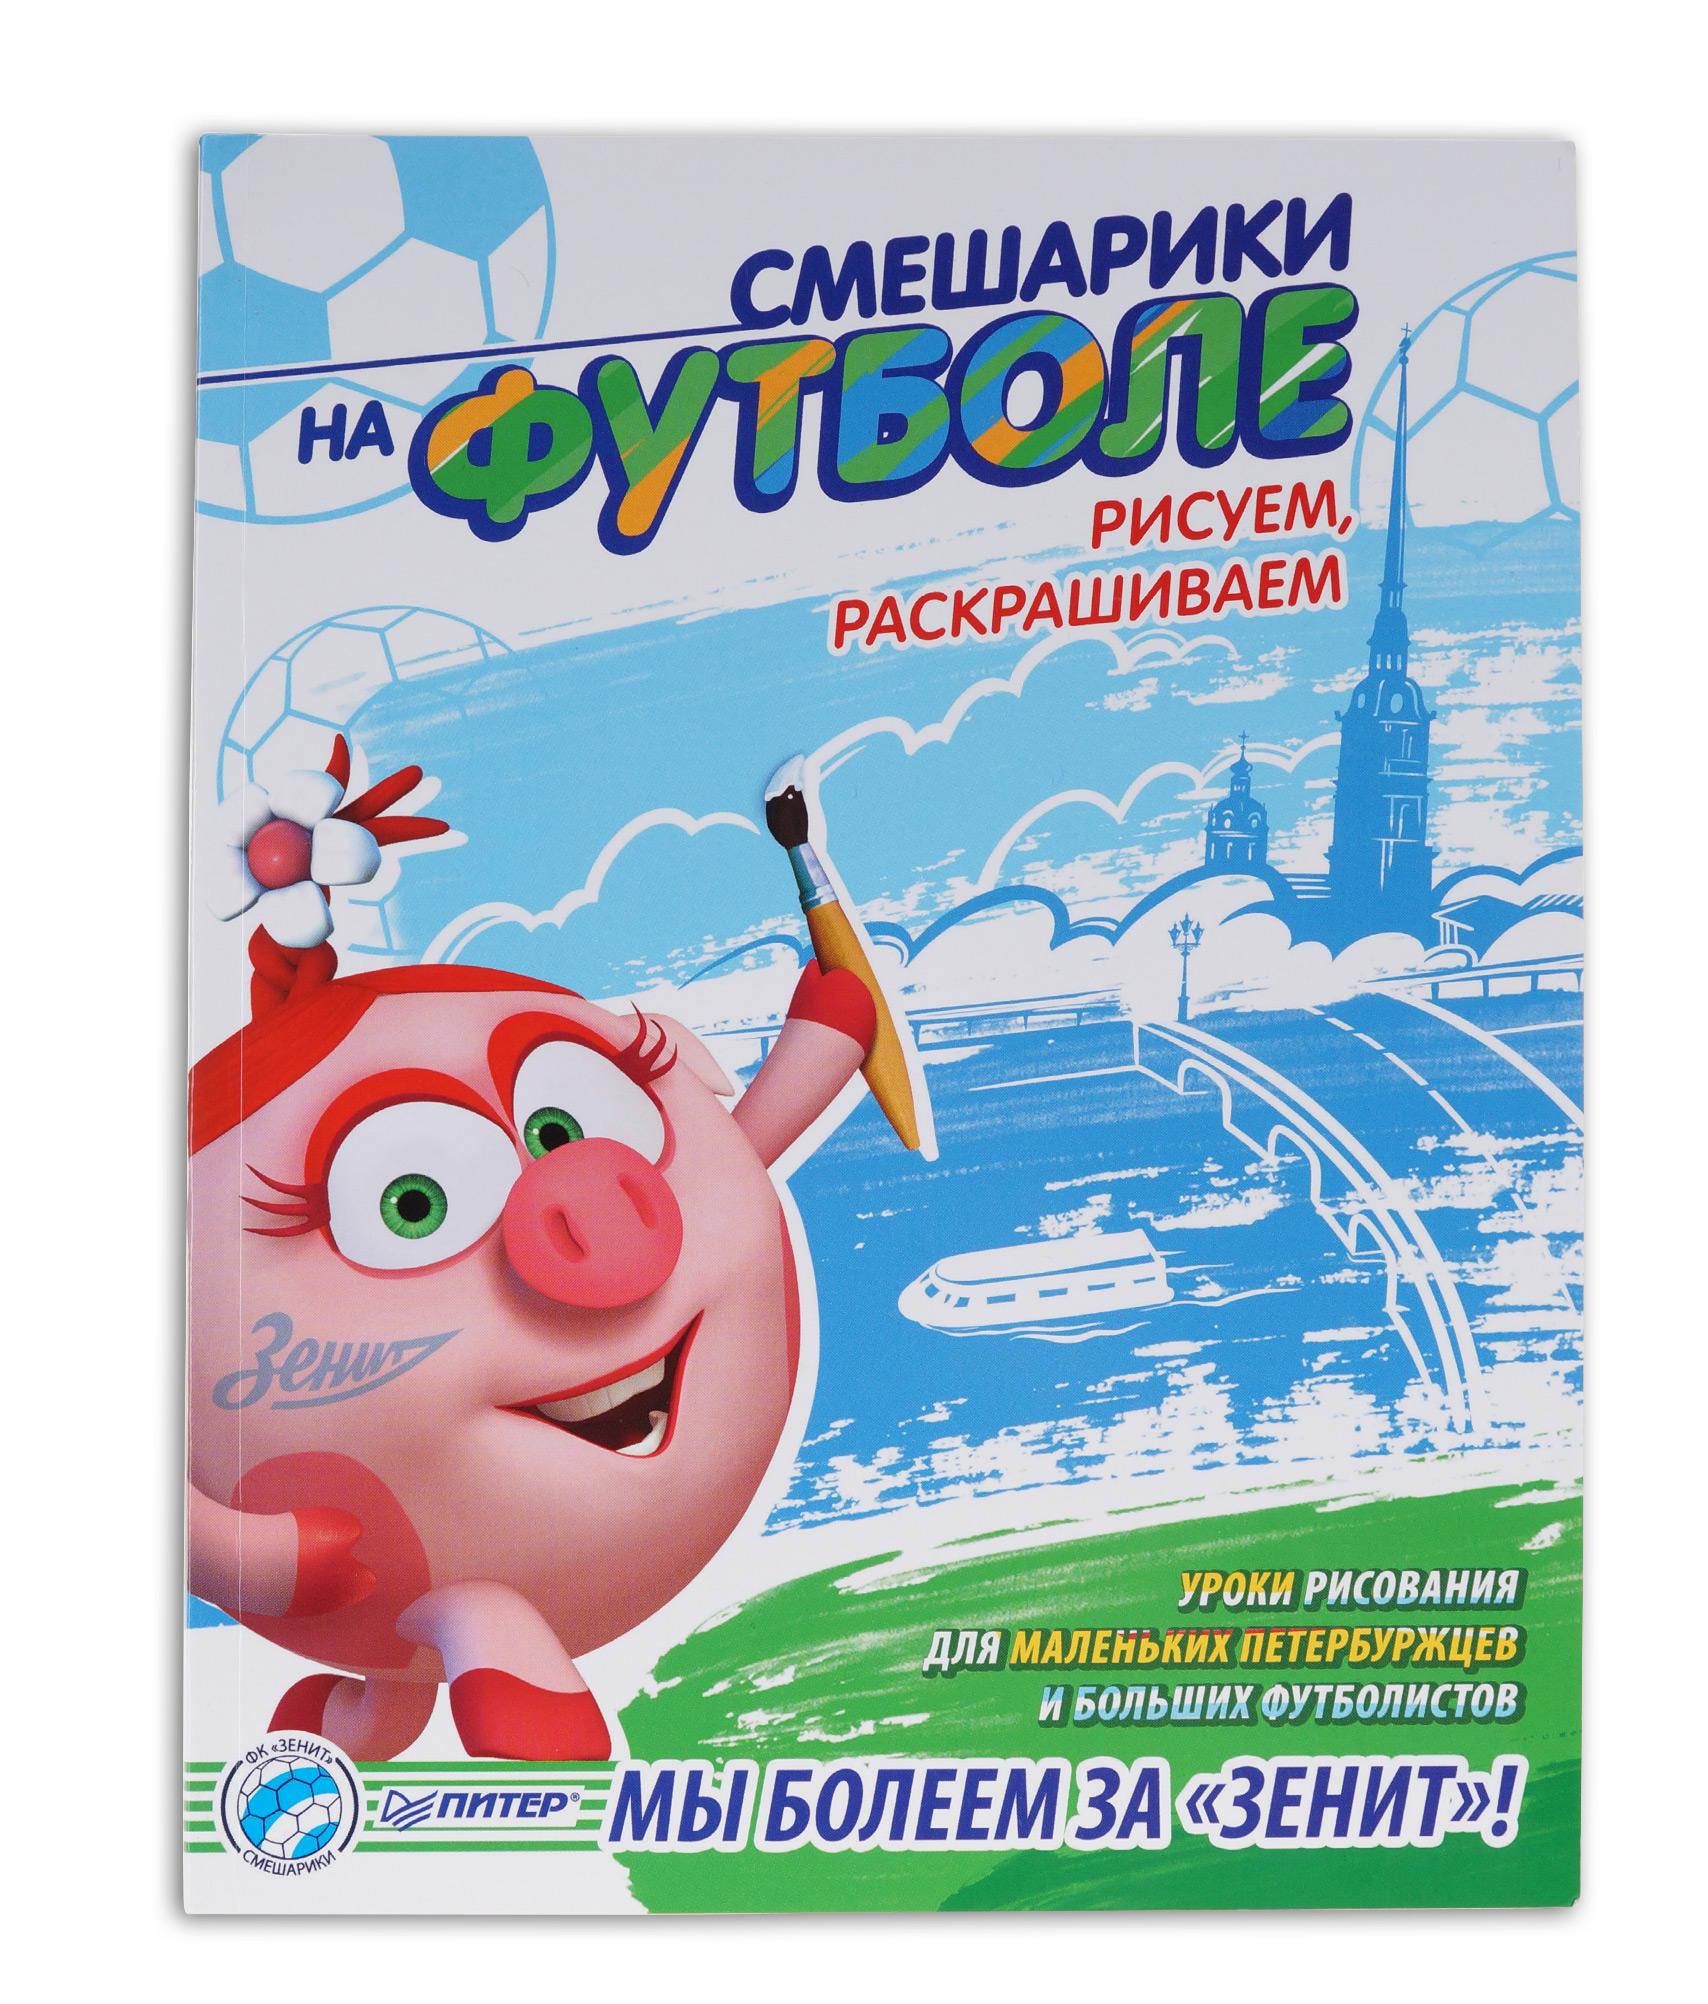 Книга «Смешарики на футболе. Рисуем, раскрашиваем» раскраски clever рисуем раскрашиваем играем растения